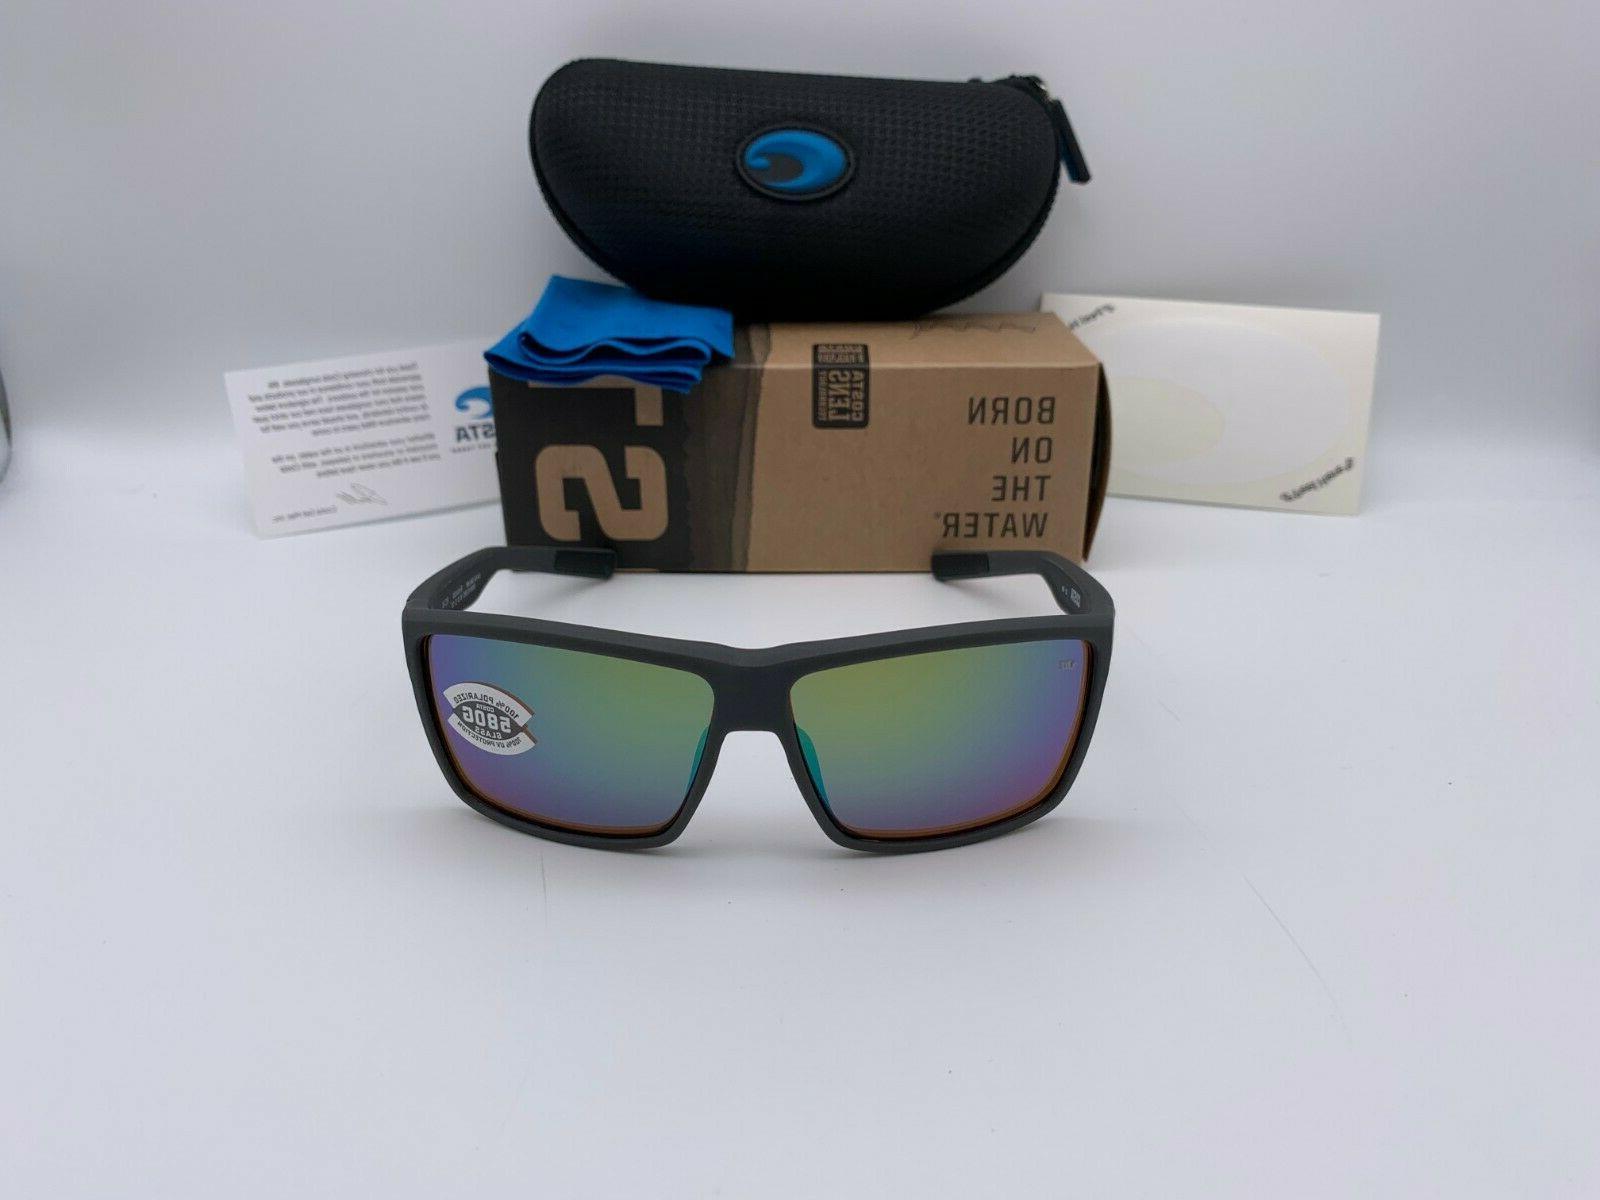 NEW RINCONCITO Polarized Sunglasses Gray Green 580G 98